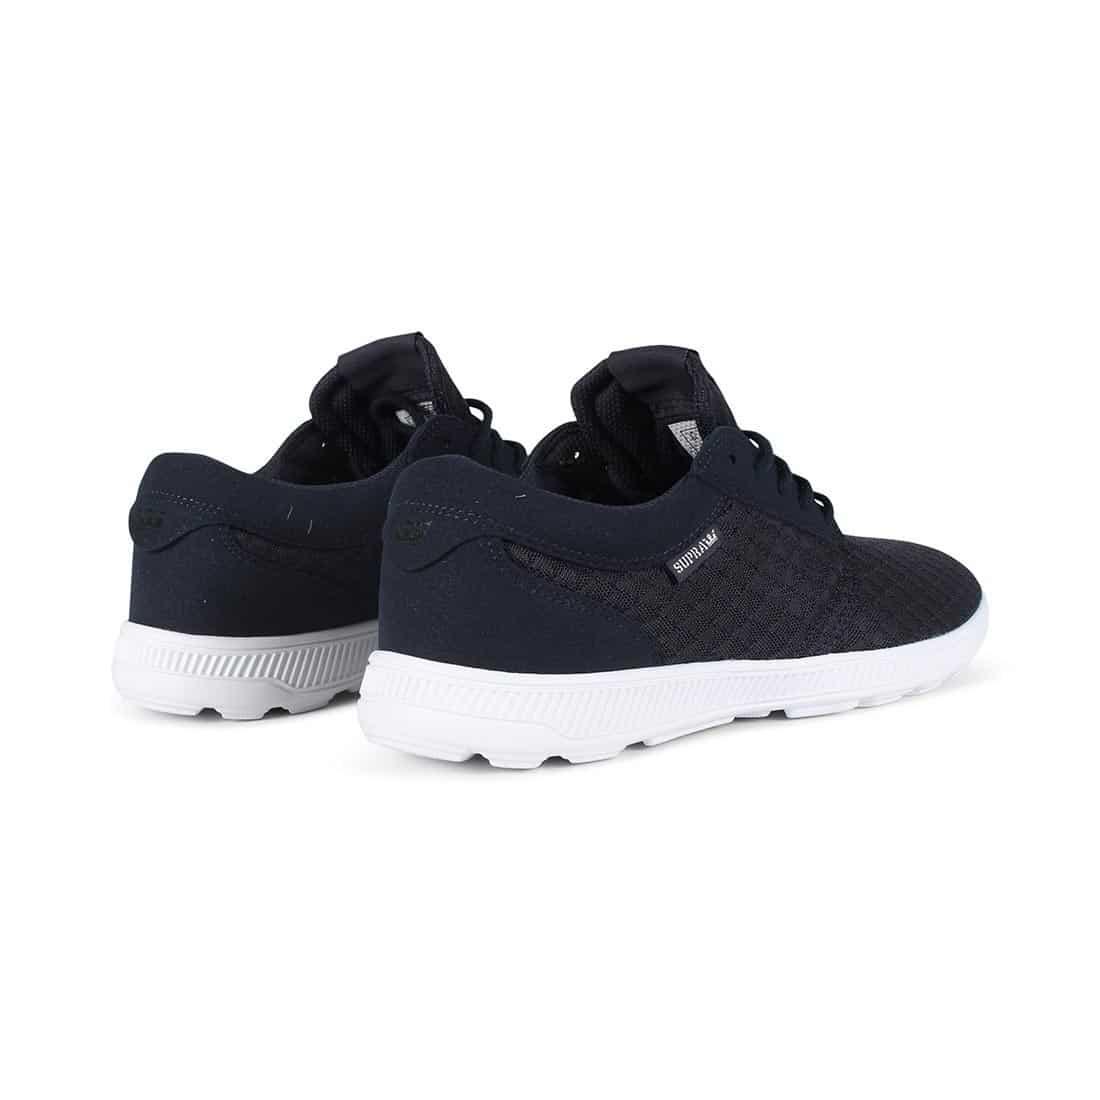 45401357890d Supra Hammer Run Shoes - Navy   Lt Grey   White